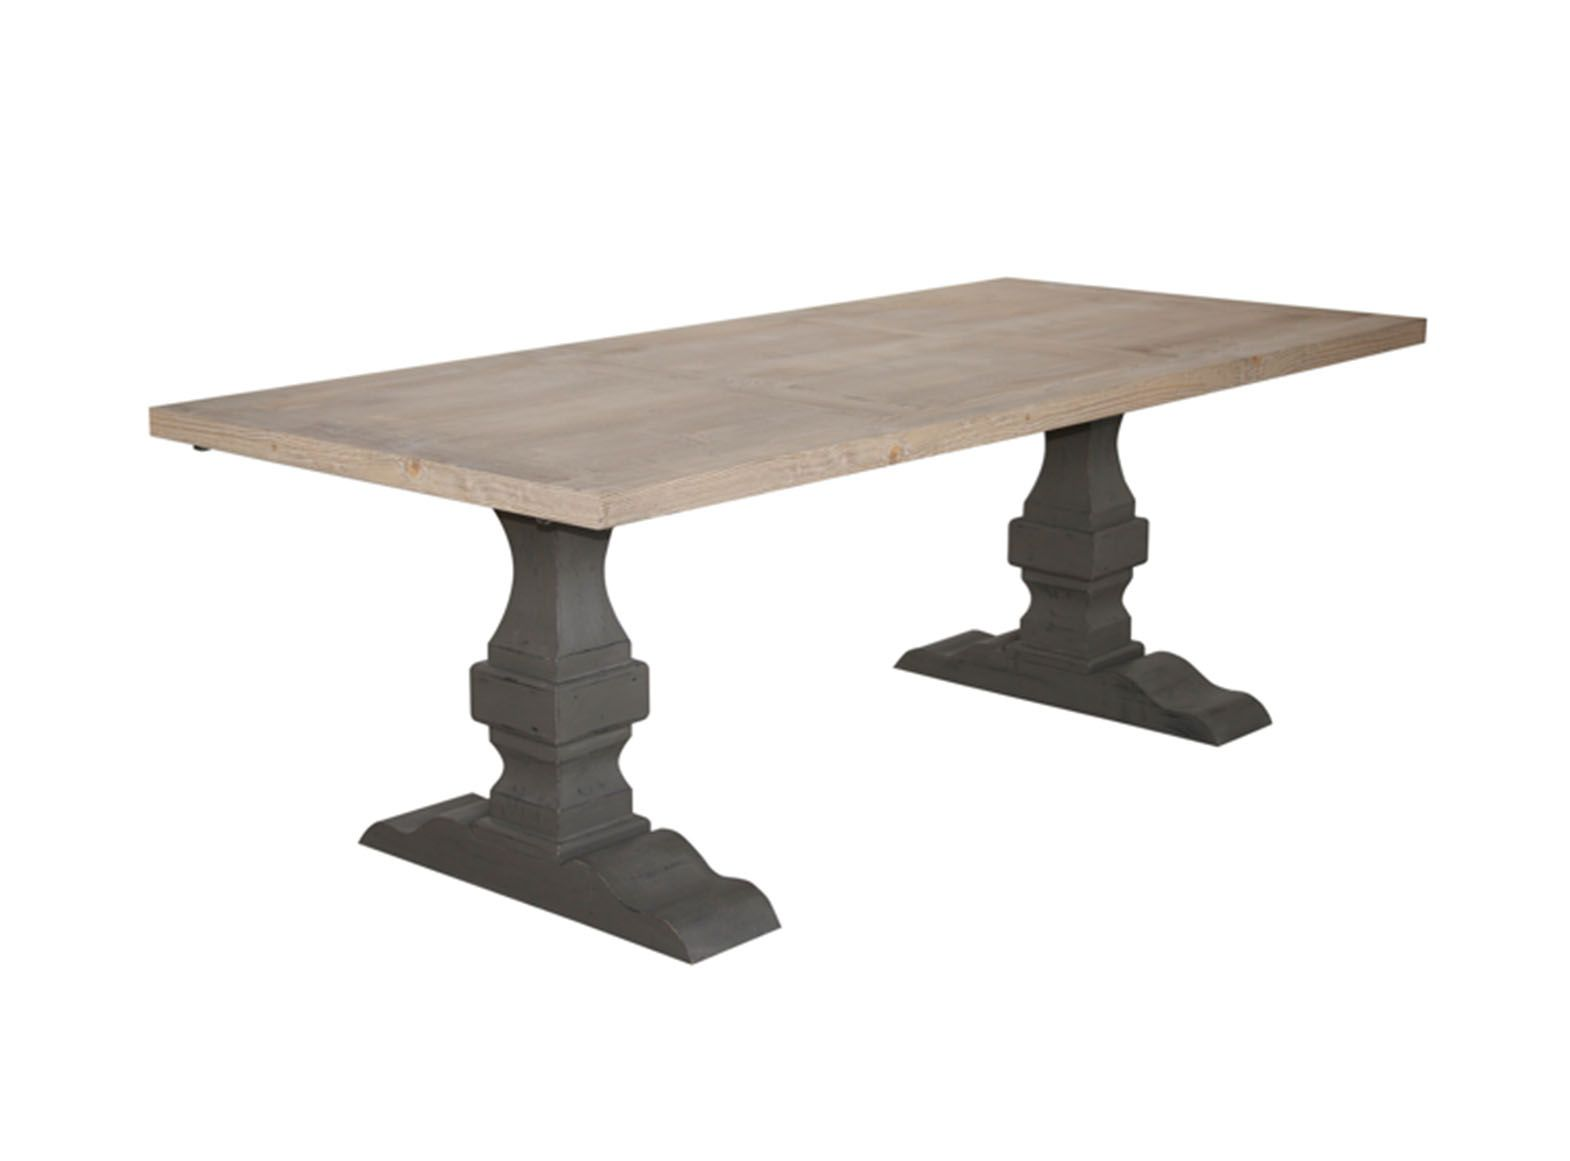 table de repas monastere pieds massif 200 cm jiceka d692. Black Bedroom Furniture Sets. Home Design Ideas